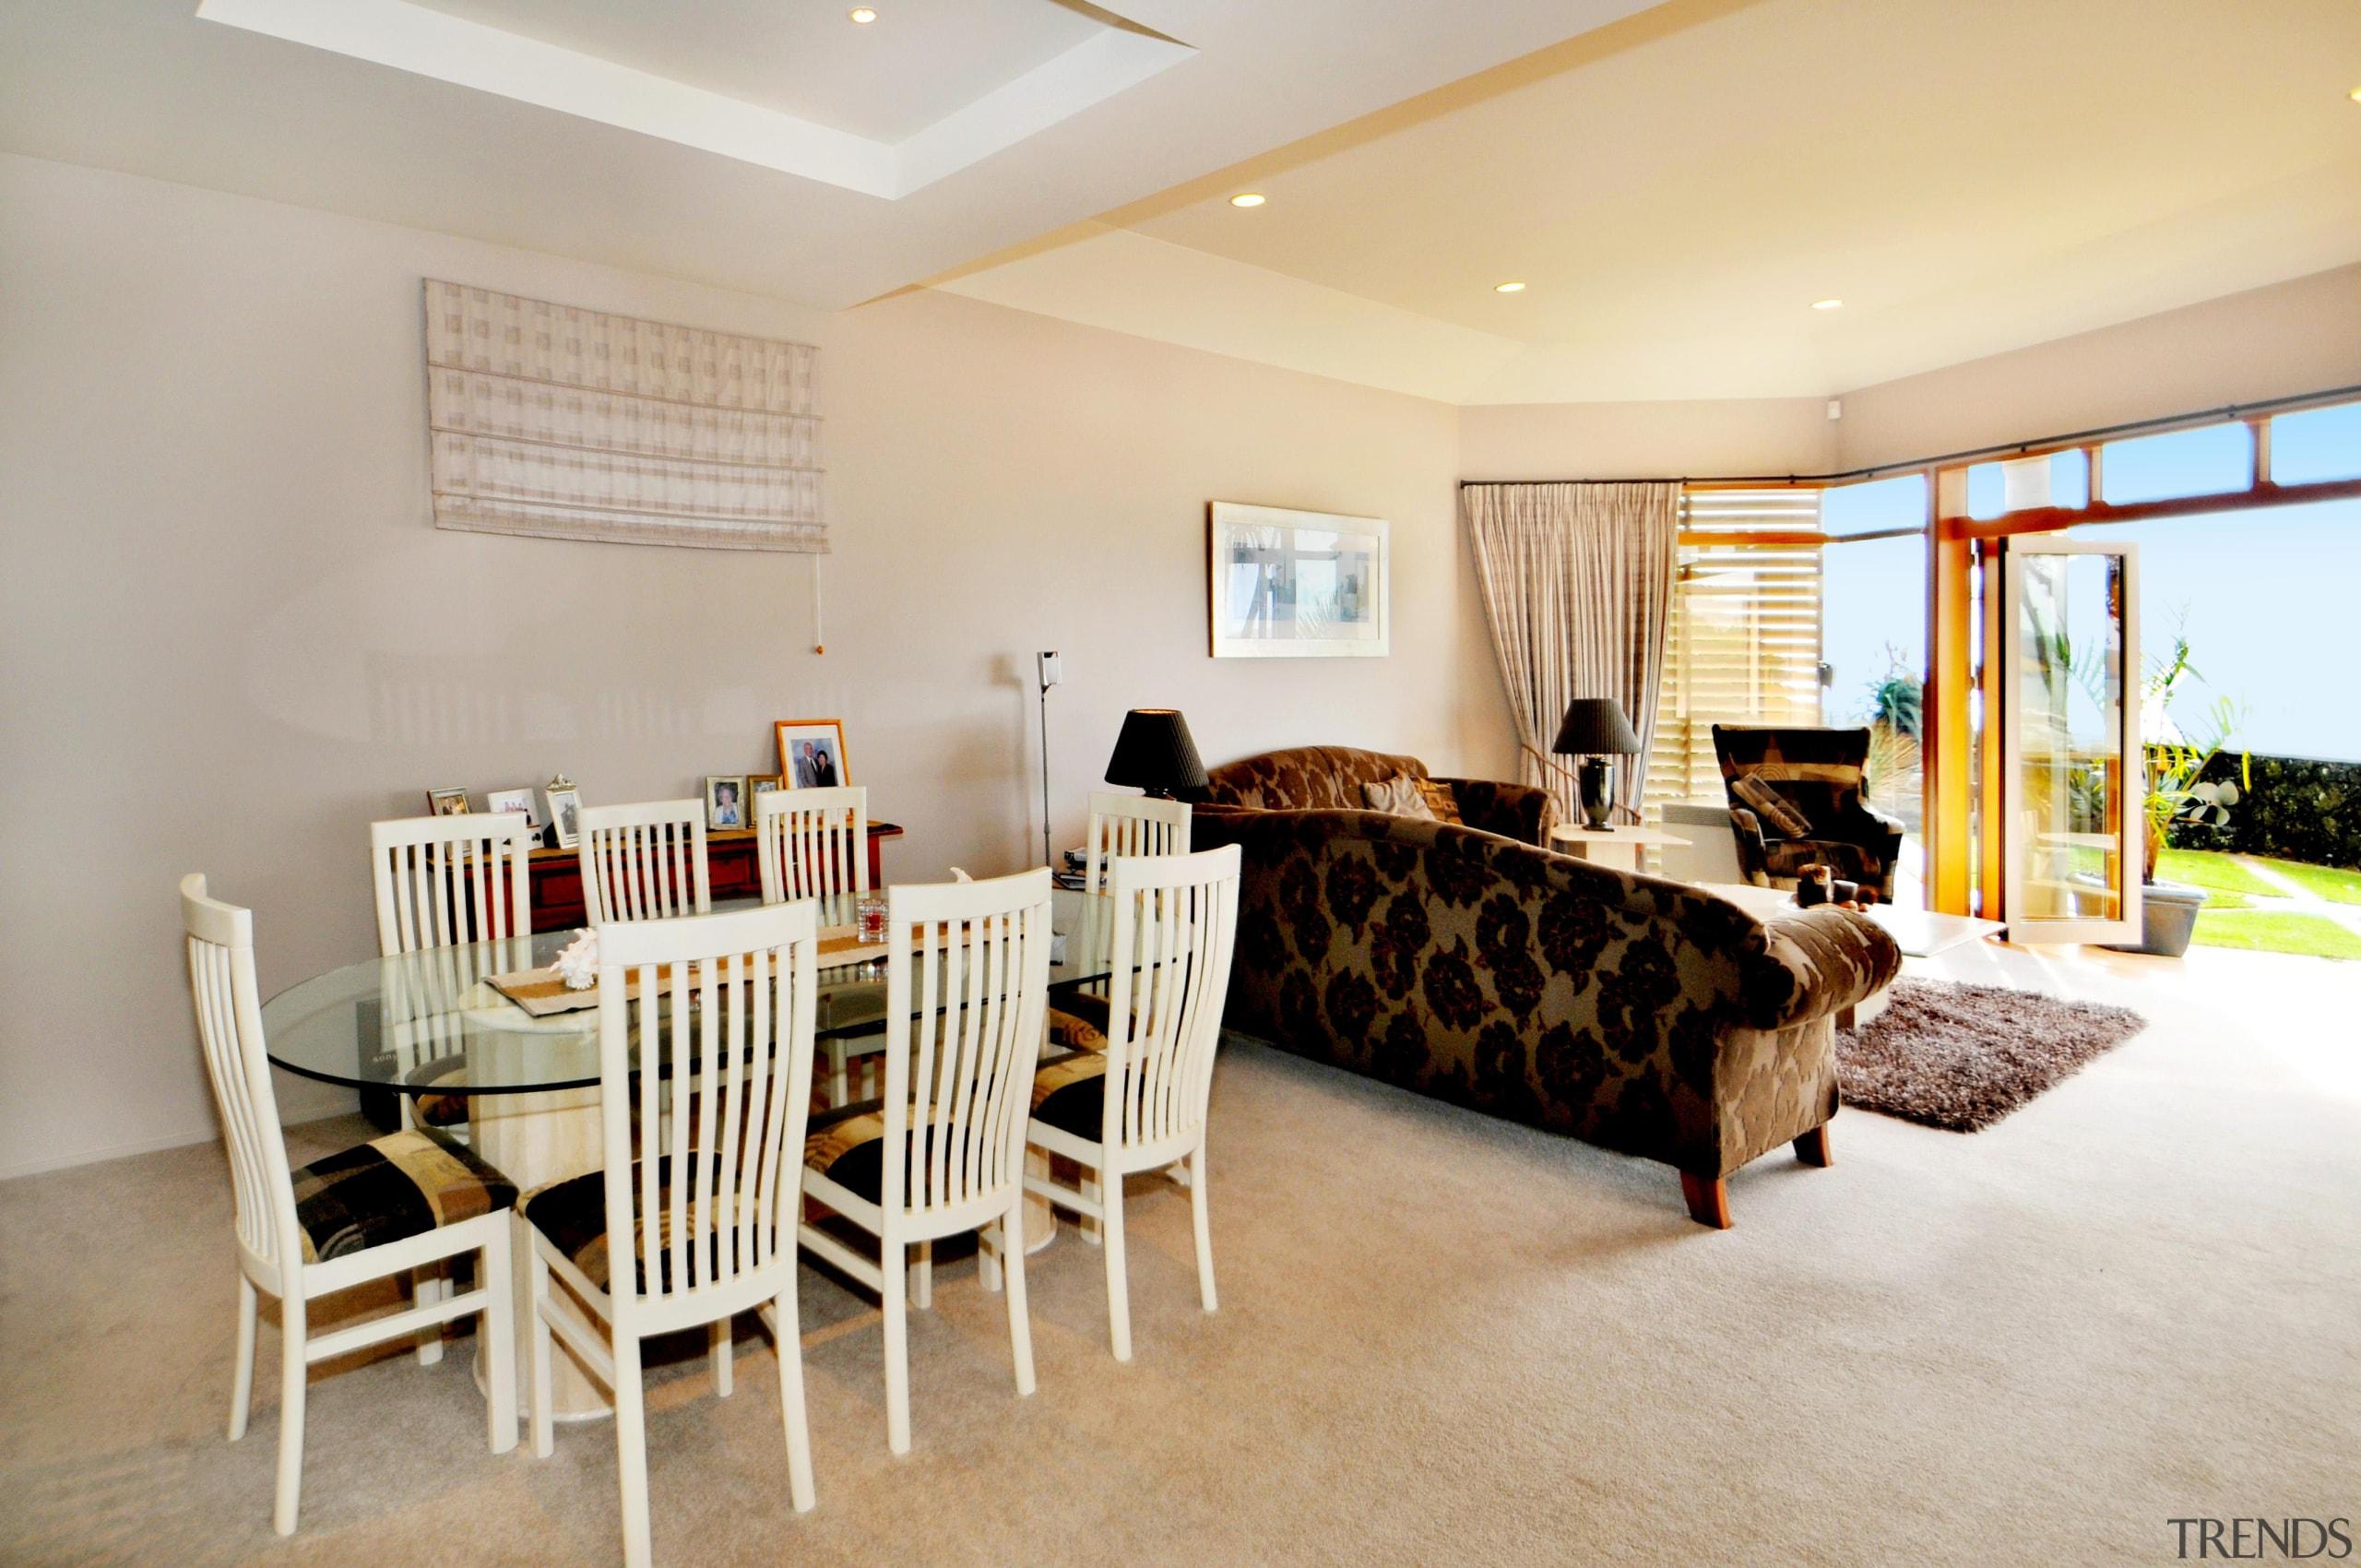 Living - ceiling | estate | floor | ceiling, estate, floor, flooring, home, interior design, living room, property, real estate, room, gray